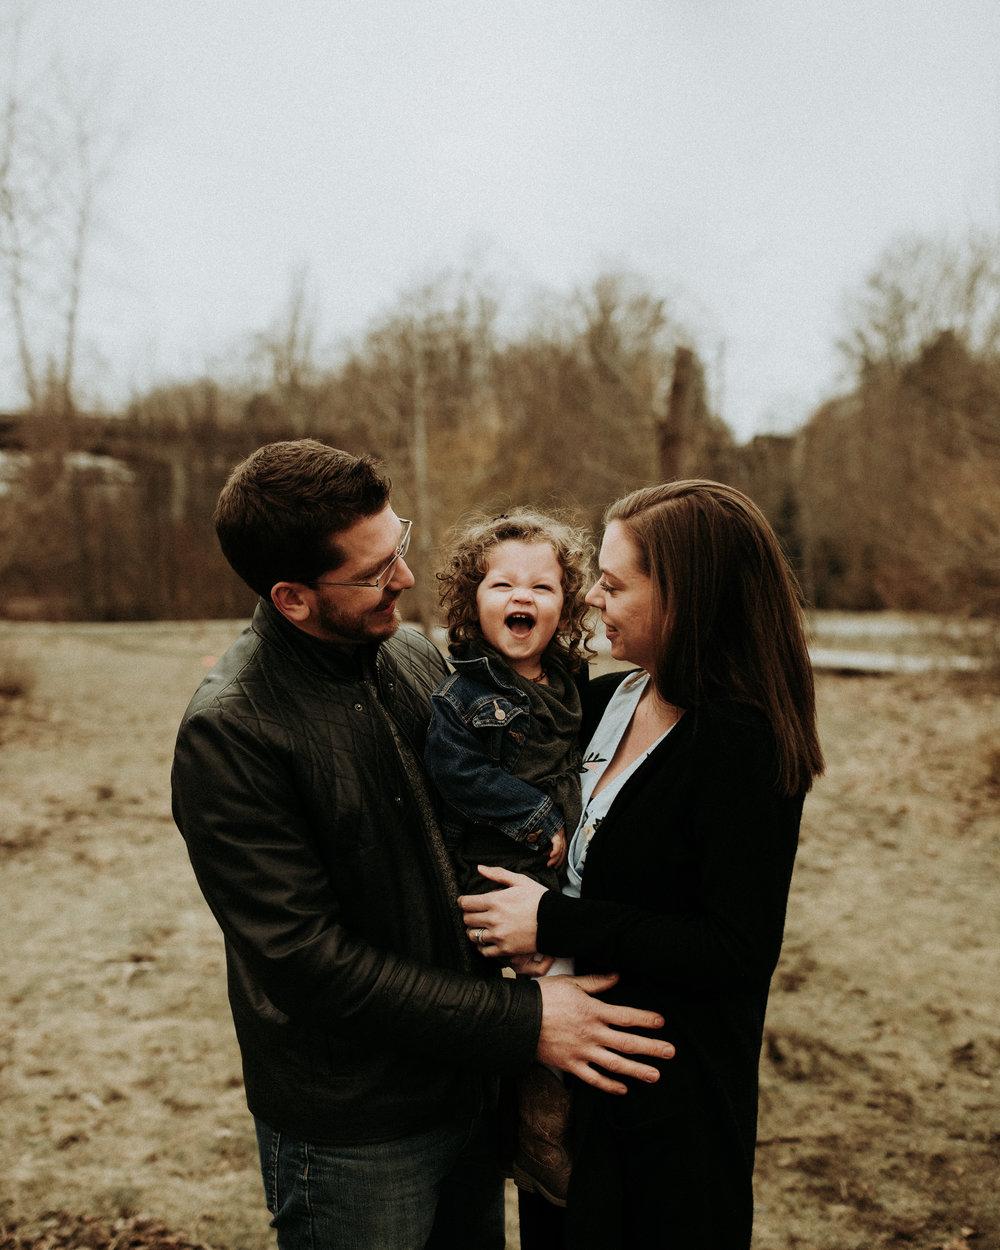 Family-Photographer-Bellingham-WA-Brianne-Bell-Photograpy-(Anya)-244.jpg